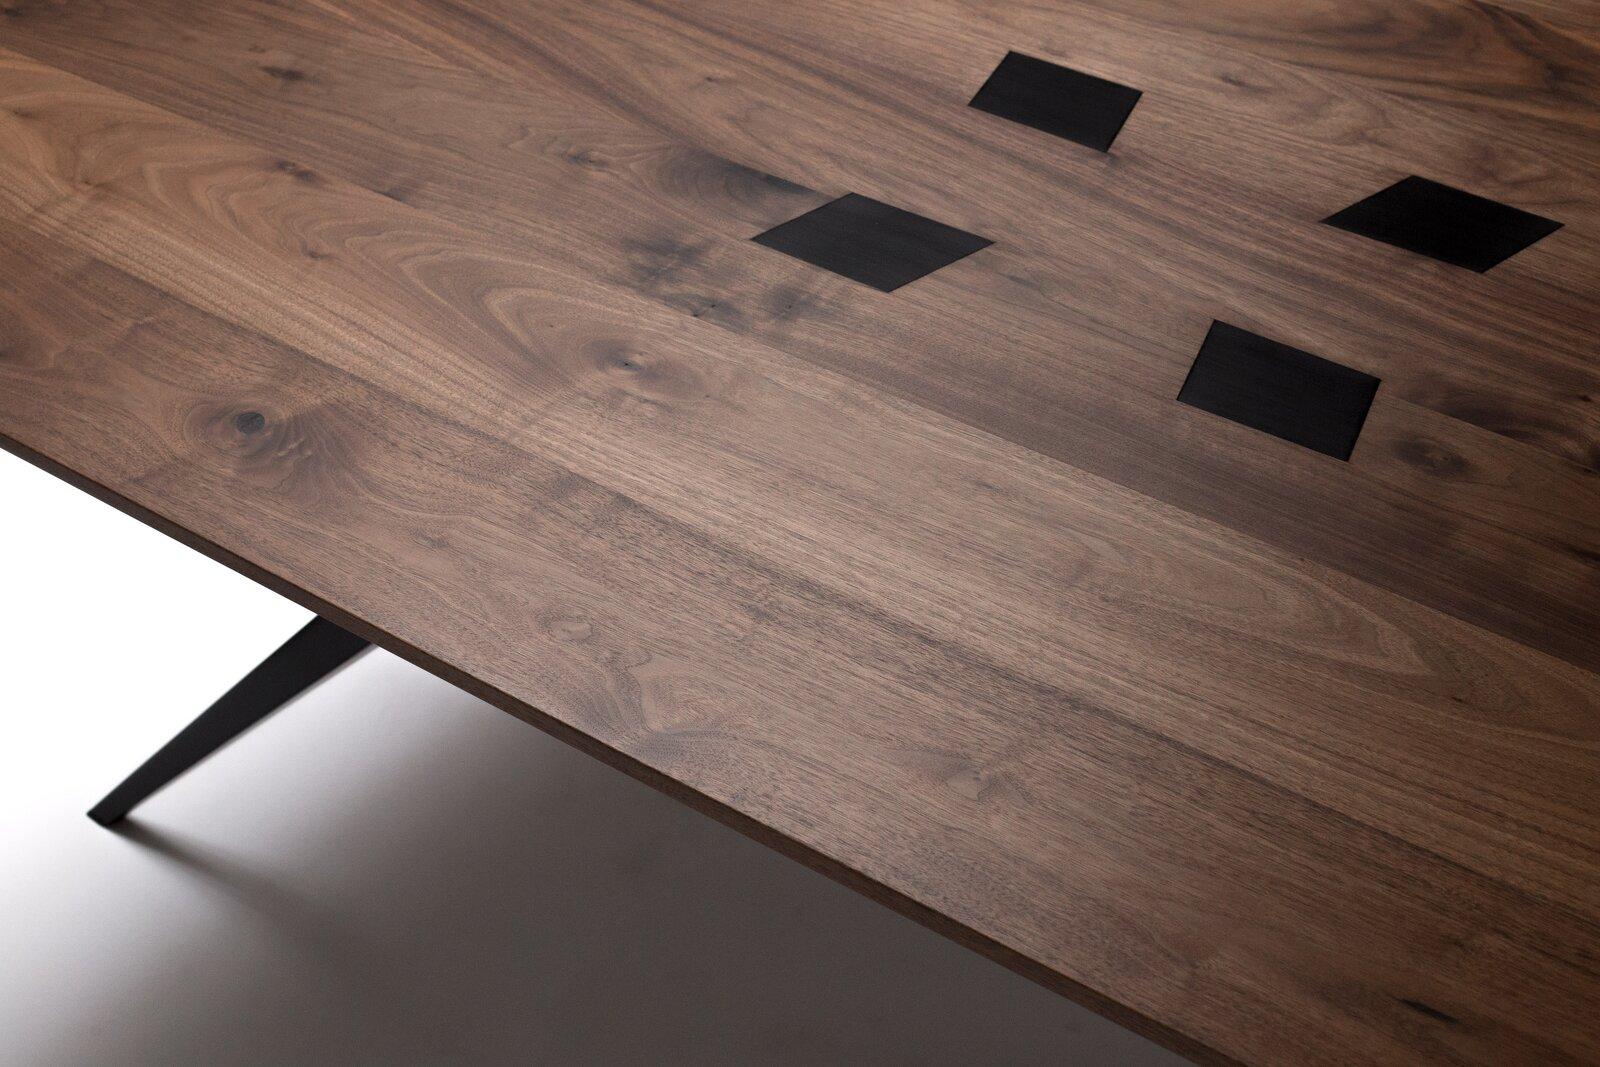 Photo 6 of 7 in Designer to Know: Manjiro Design